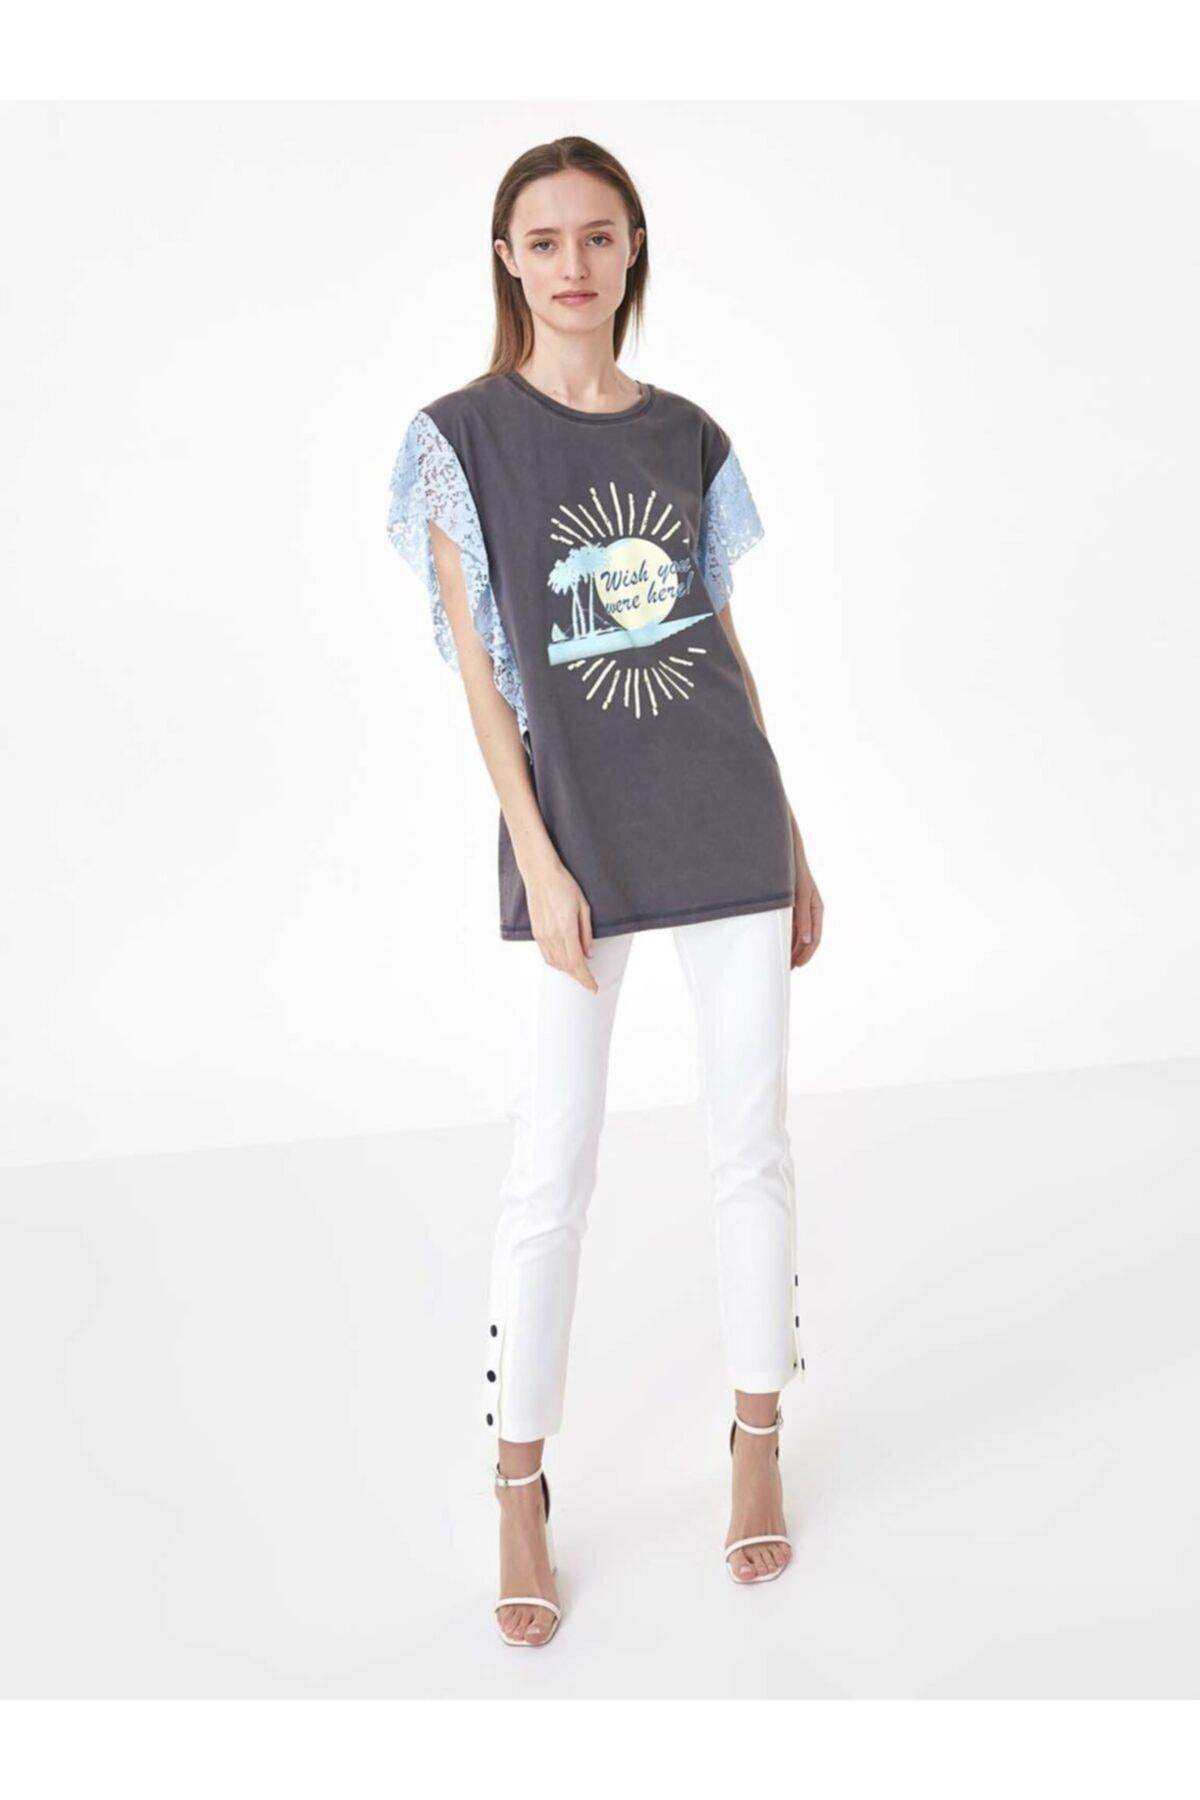 Twist Kadın Gri Dantel Mixli Tshirt TS1200070160126 2